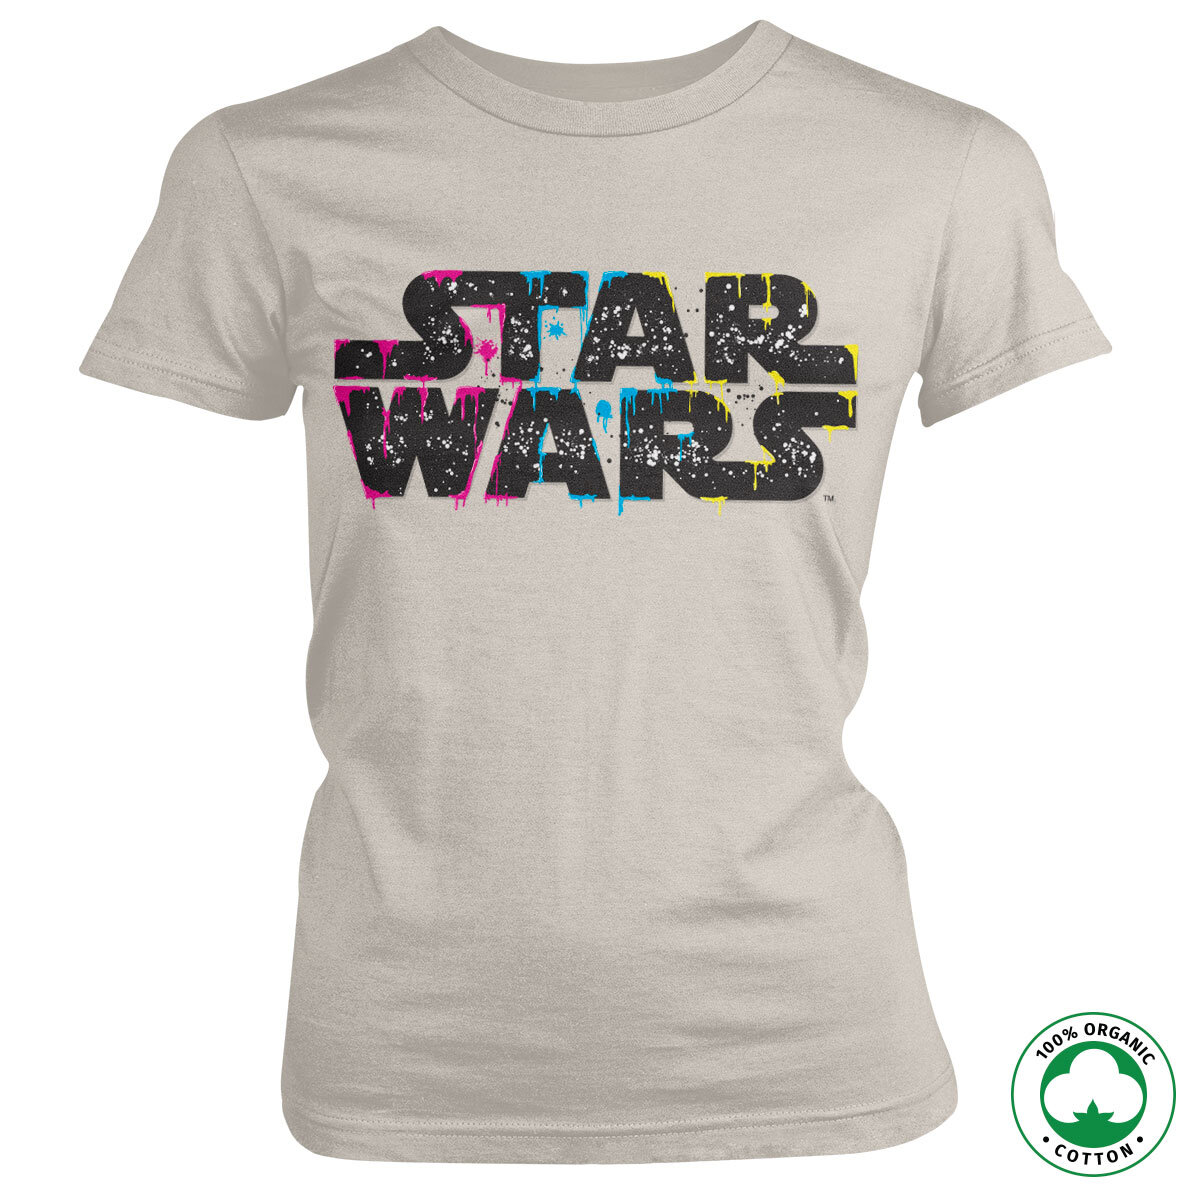 Inked Star Wars Logo Organic Girly Tee